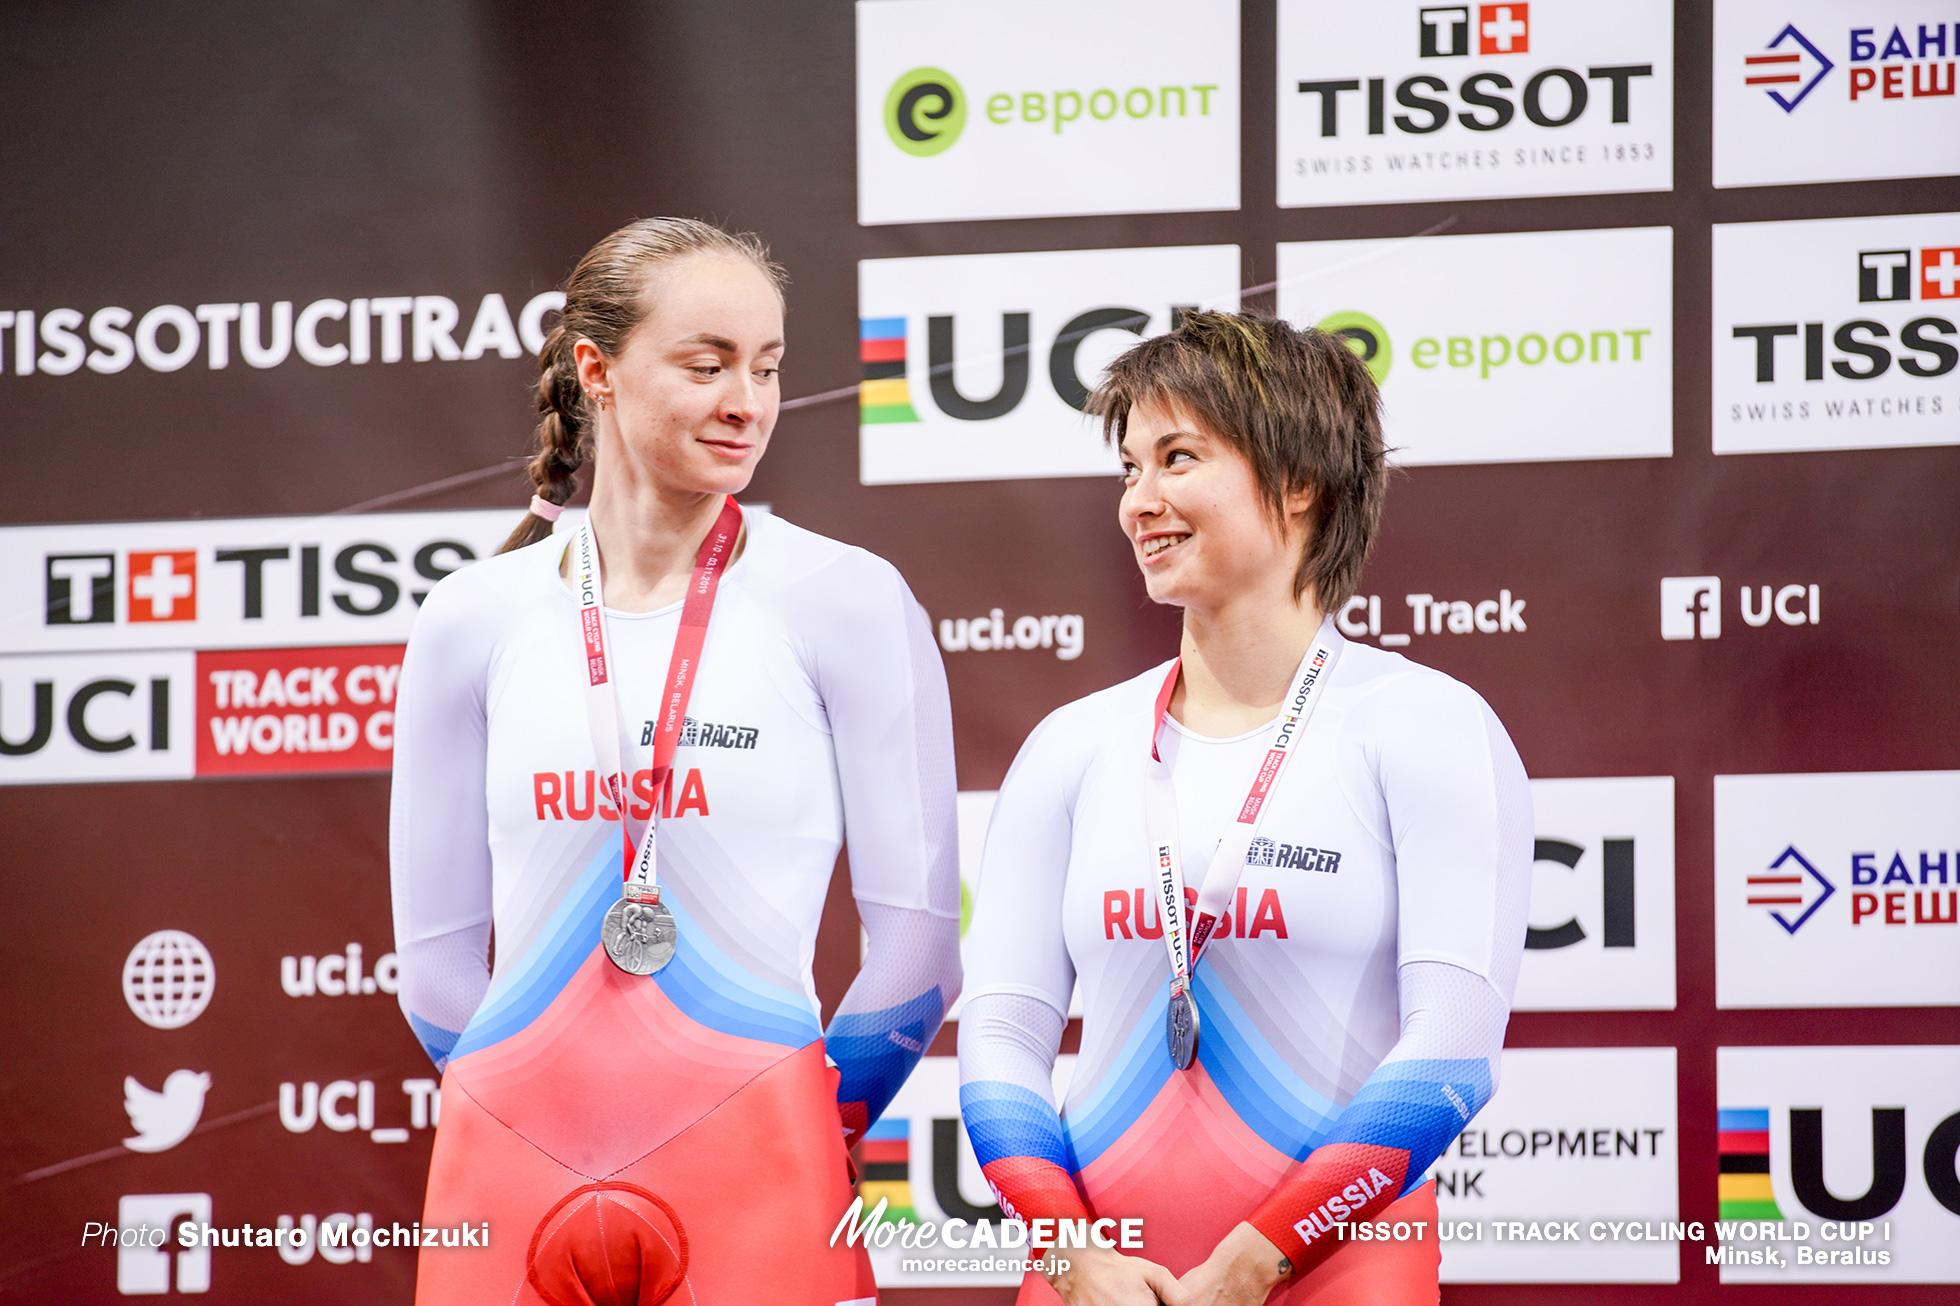 Russia (Ekaterina Gnidenko, Natalia Antonova), Final / Women's Team Sprint / TISSOT UCI TRACK CYCLING WORLD CUP I, Minsk, Beralus